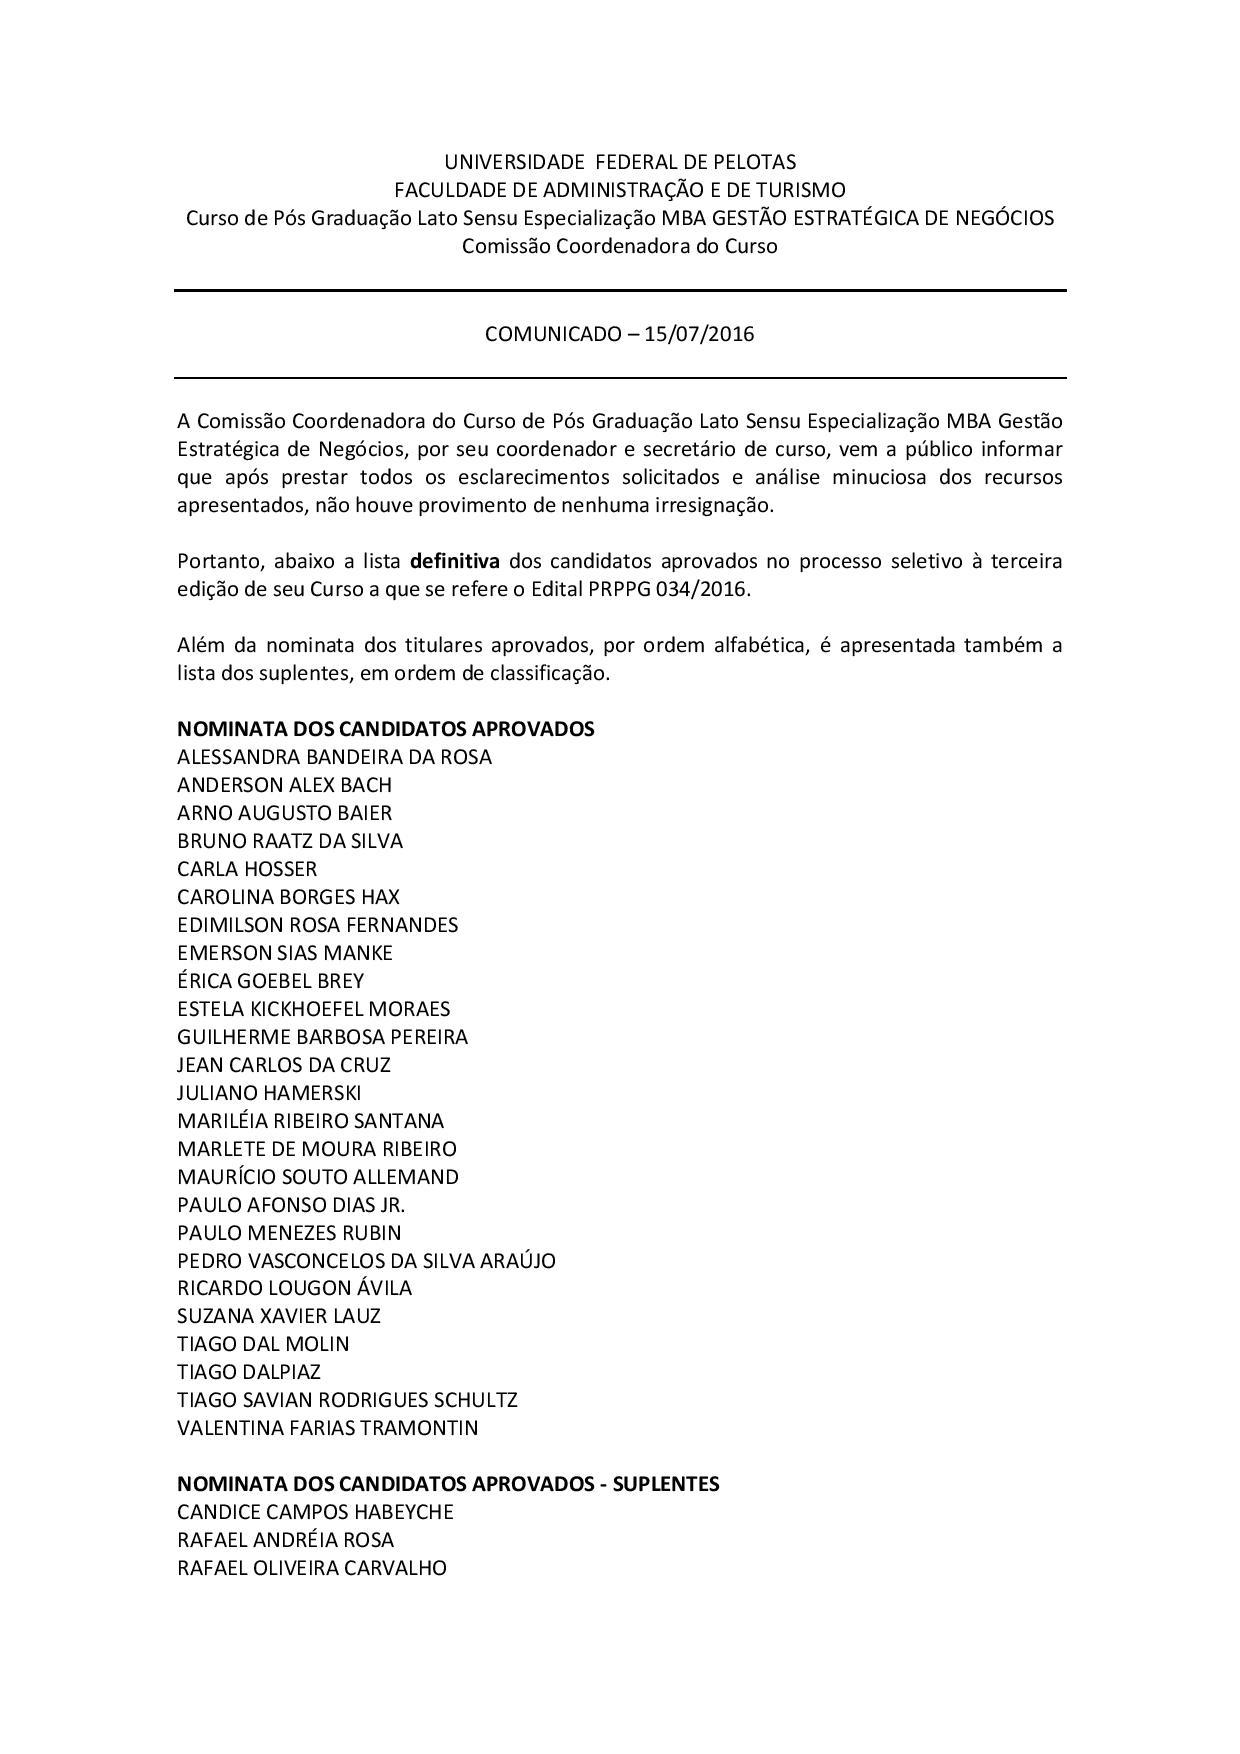 Comunicado sobre candidatos aprovados1-page-001